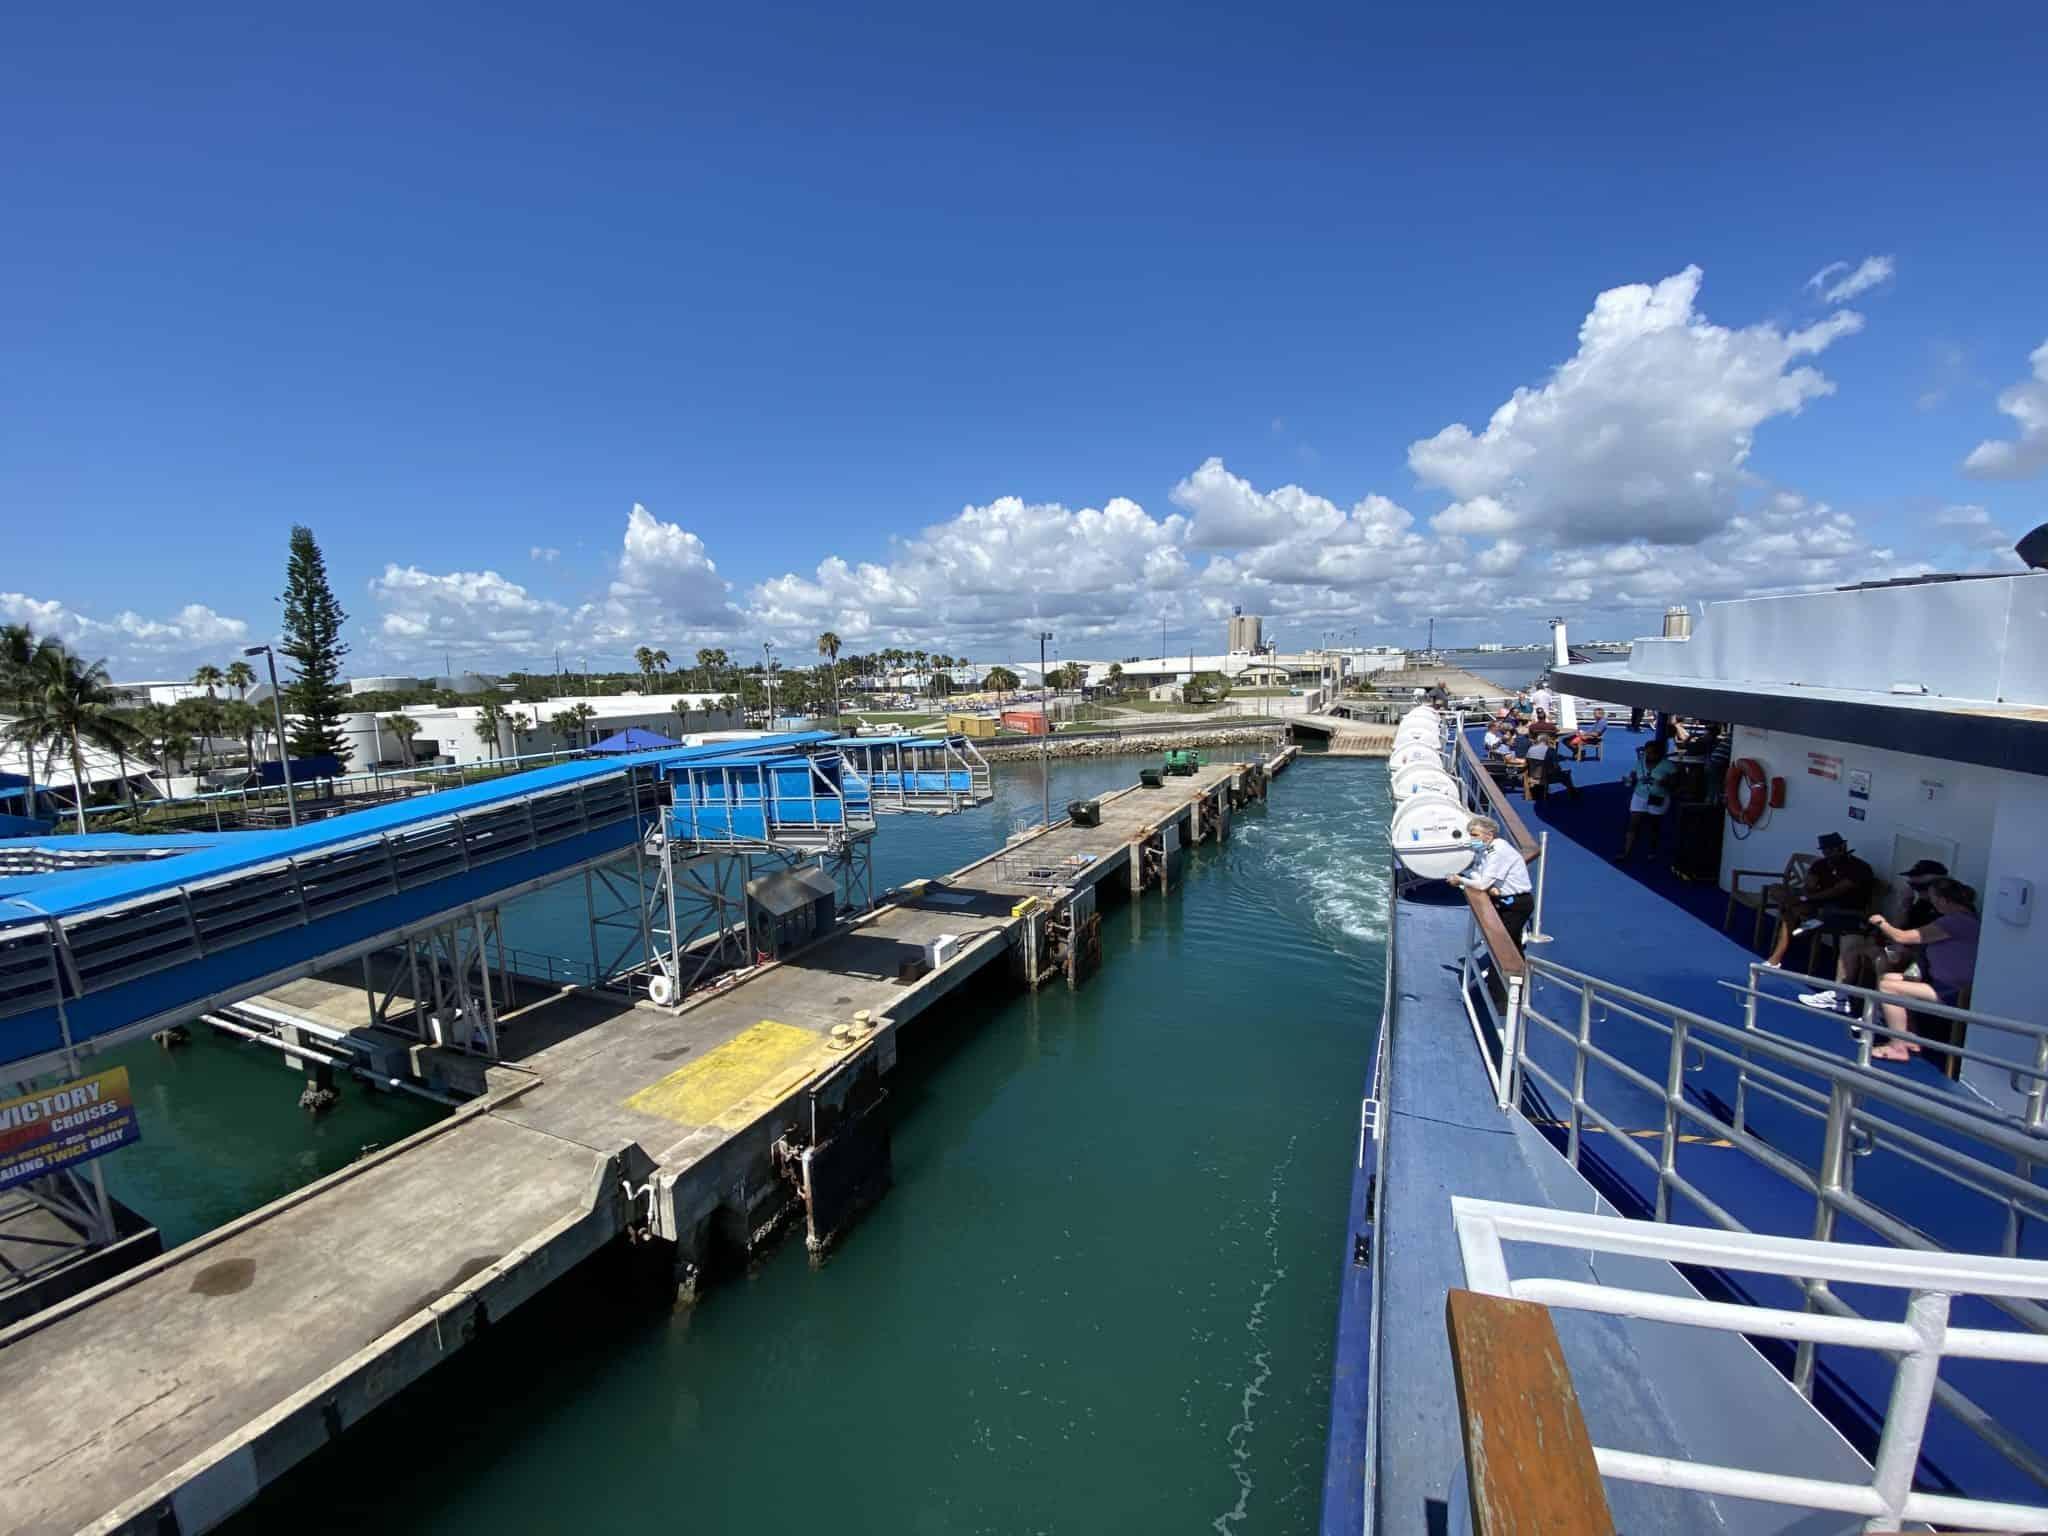 victory cruise casino dock